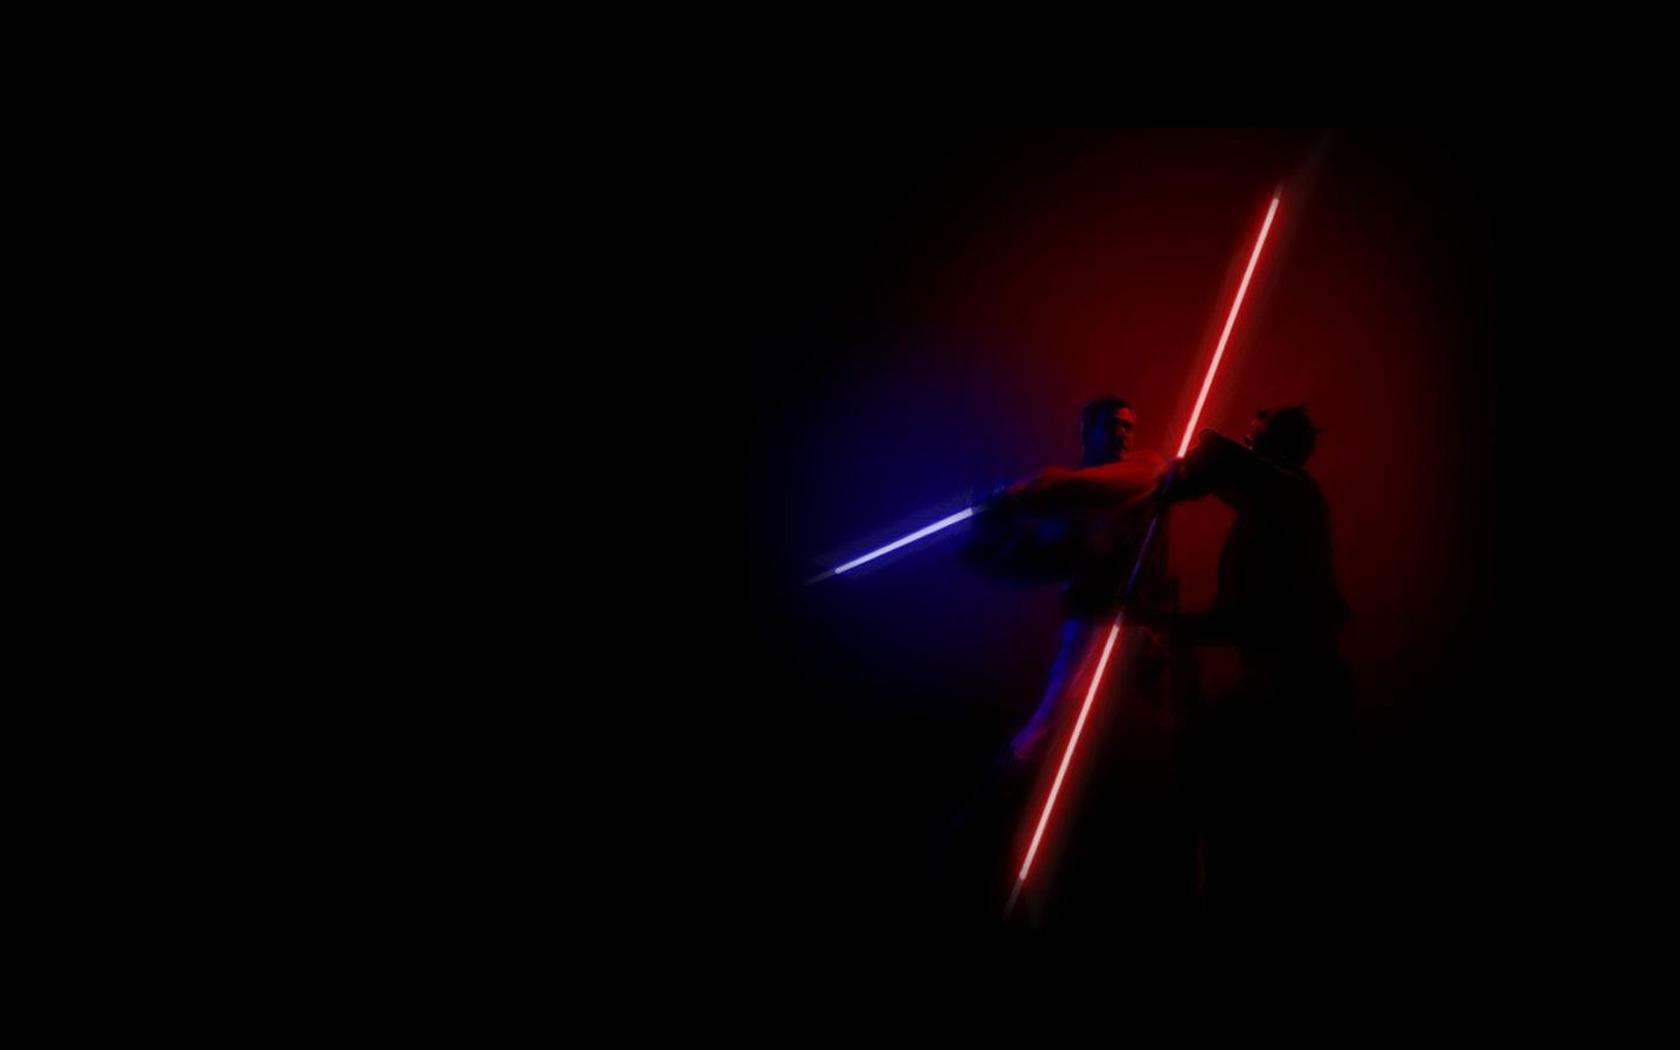 Free Download Pictures Star Wars Darth Maul Obi Wan Kenobi